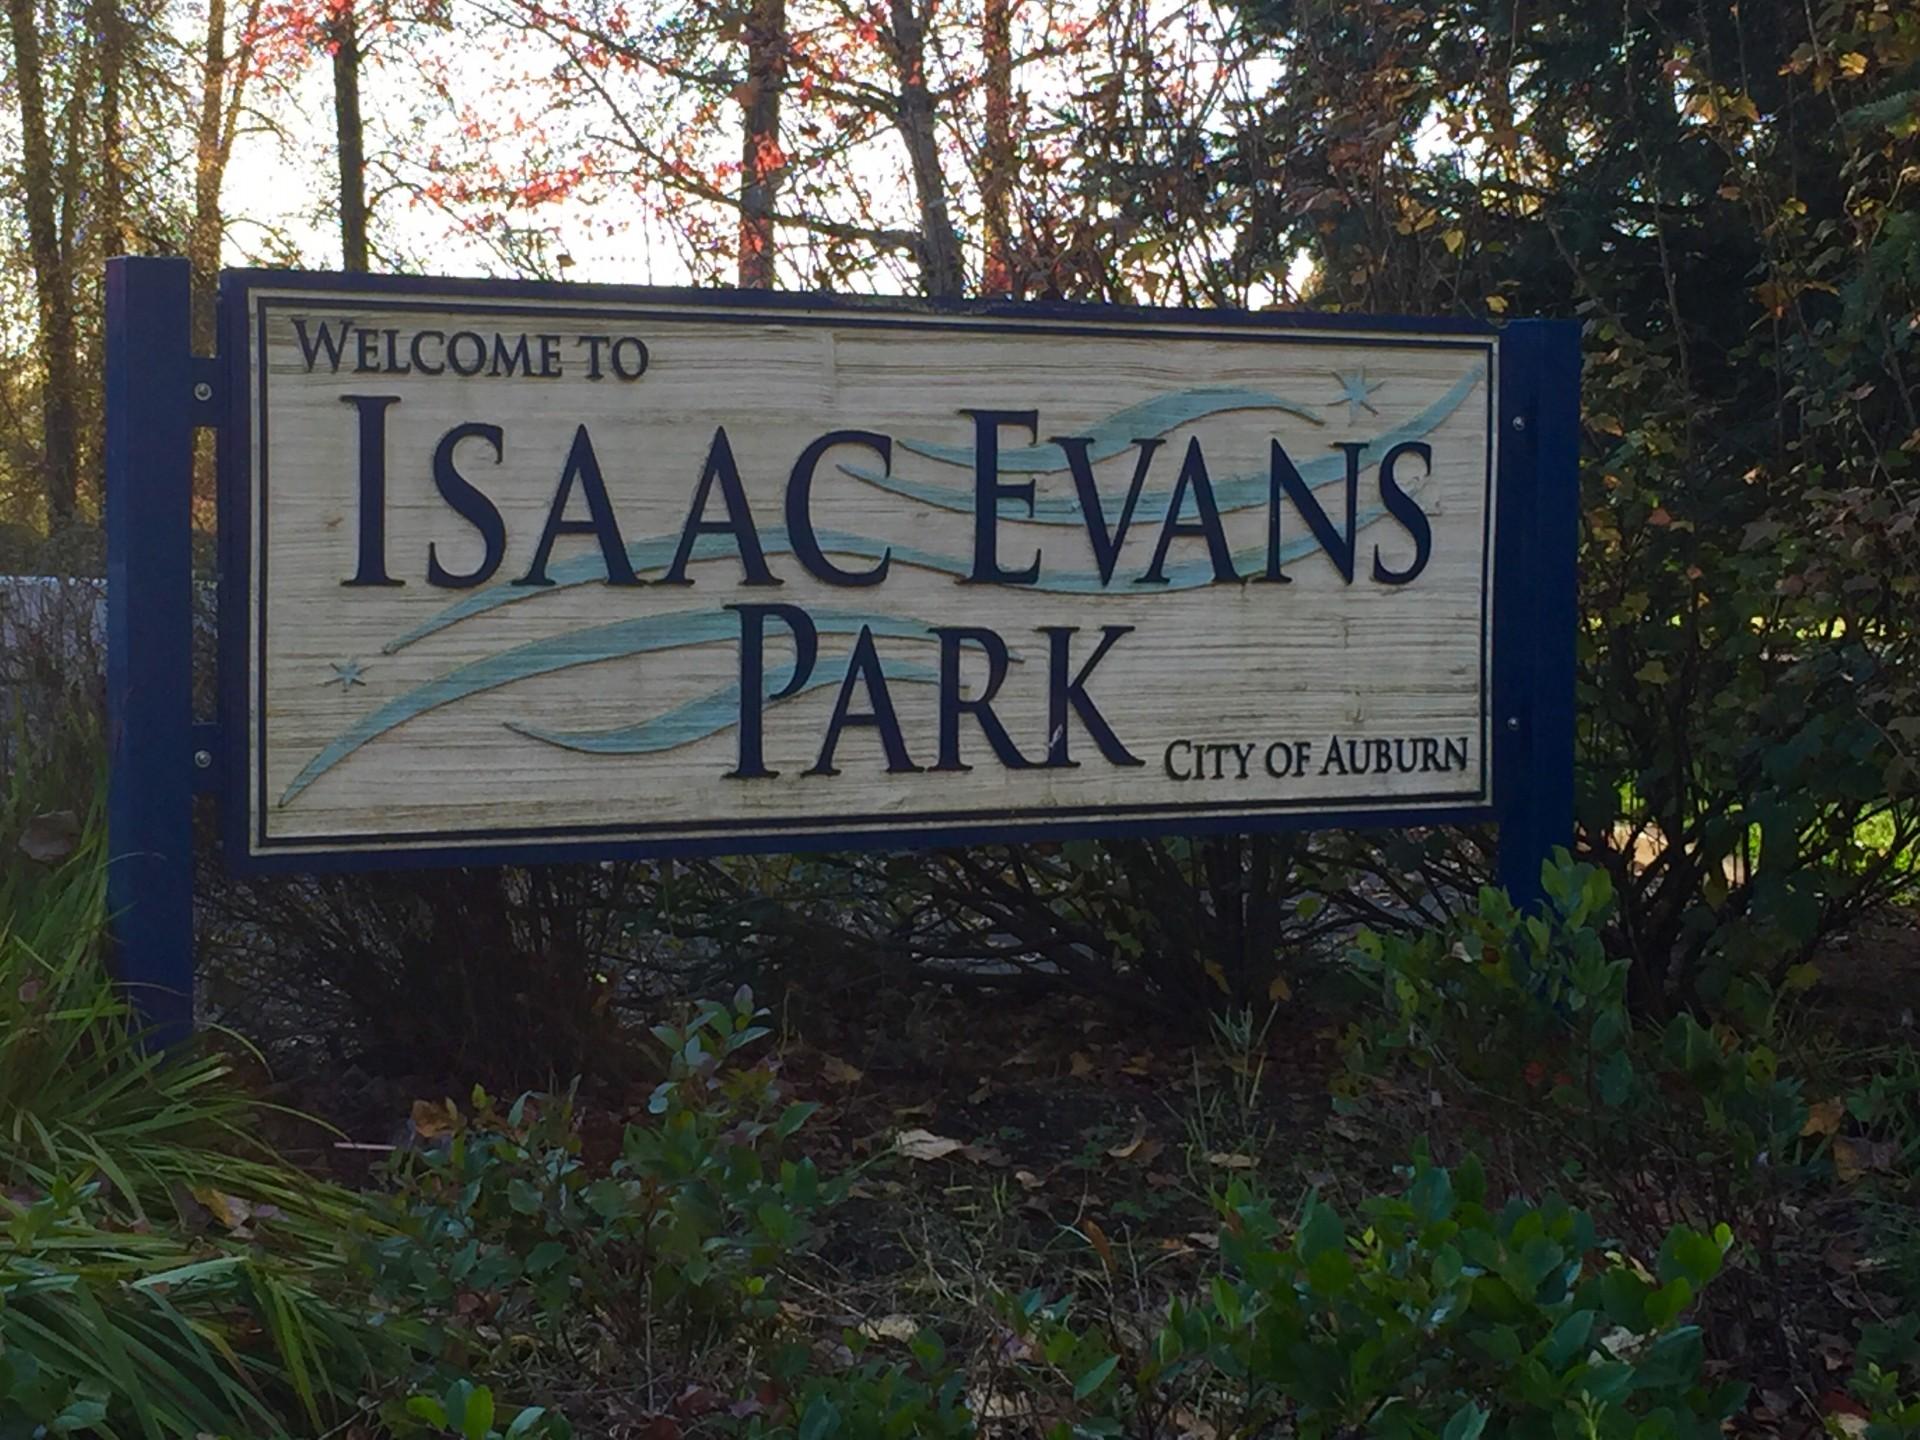 Isaac Evans Park 2